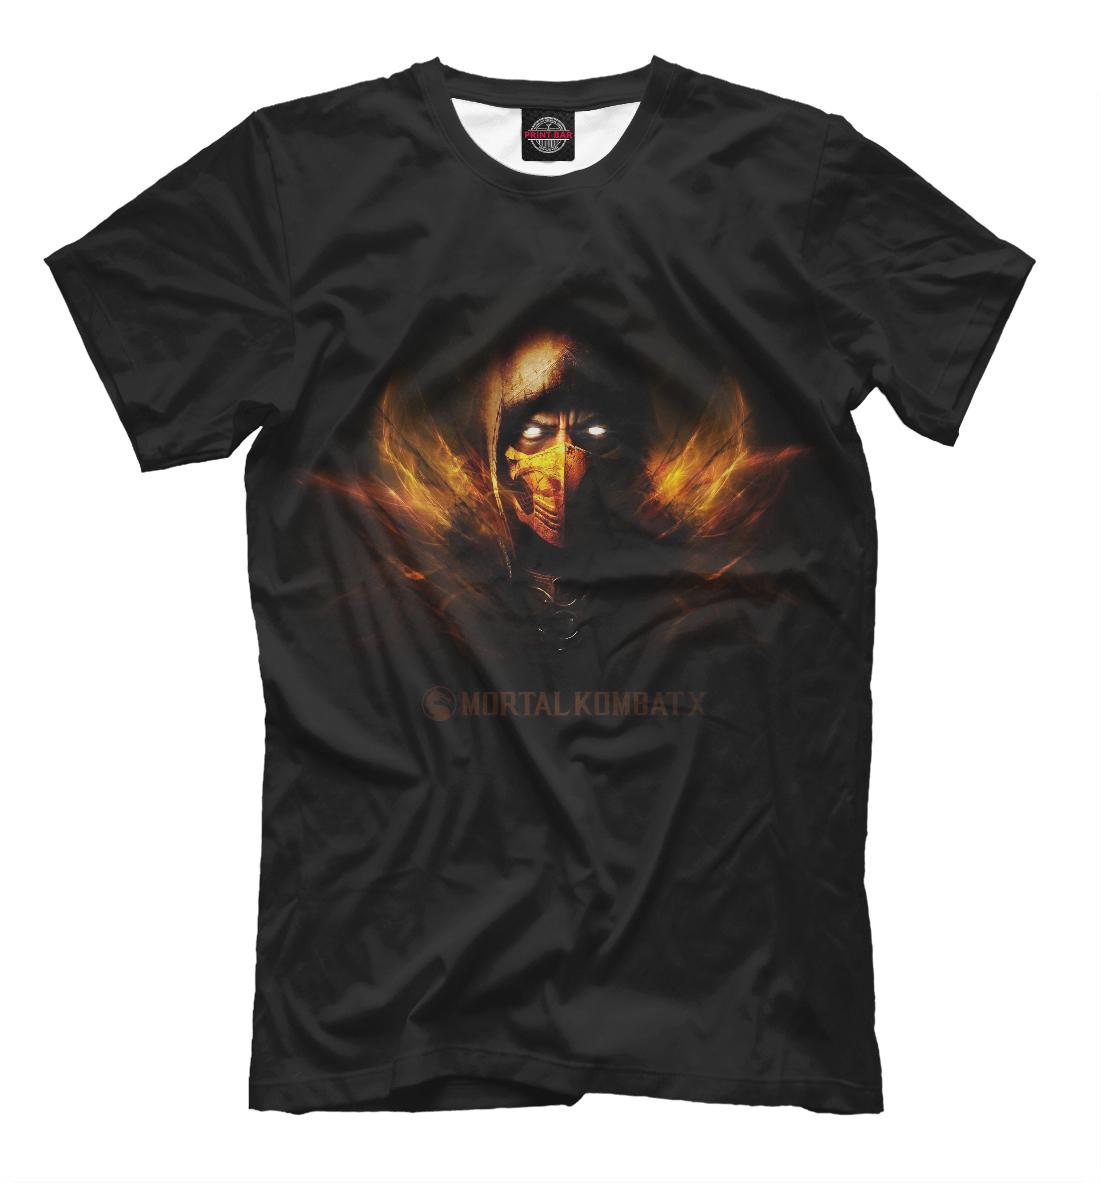 Купить Mortal Kombat (Scorpion), Printbar, Футболки, MKB-294009-fut-2